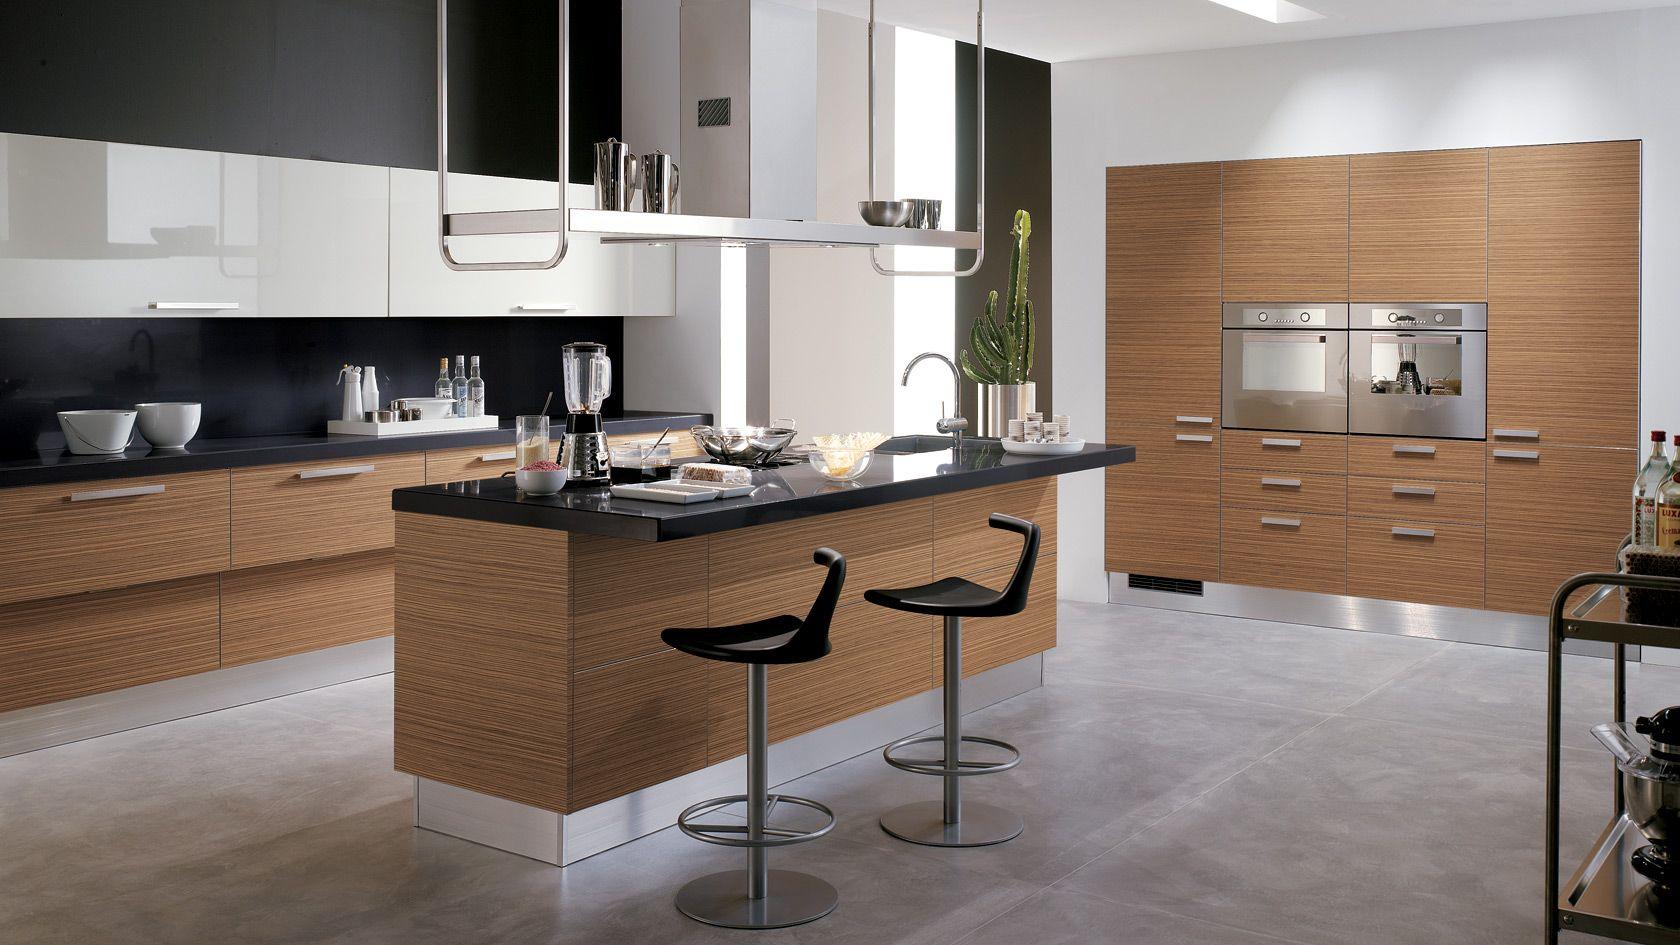 Cucina Mood Scavolini | House Ideas | Scavolini kitchens ...